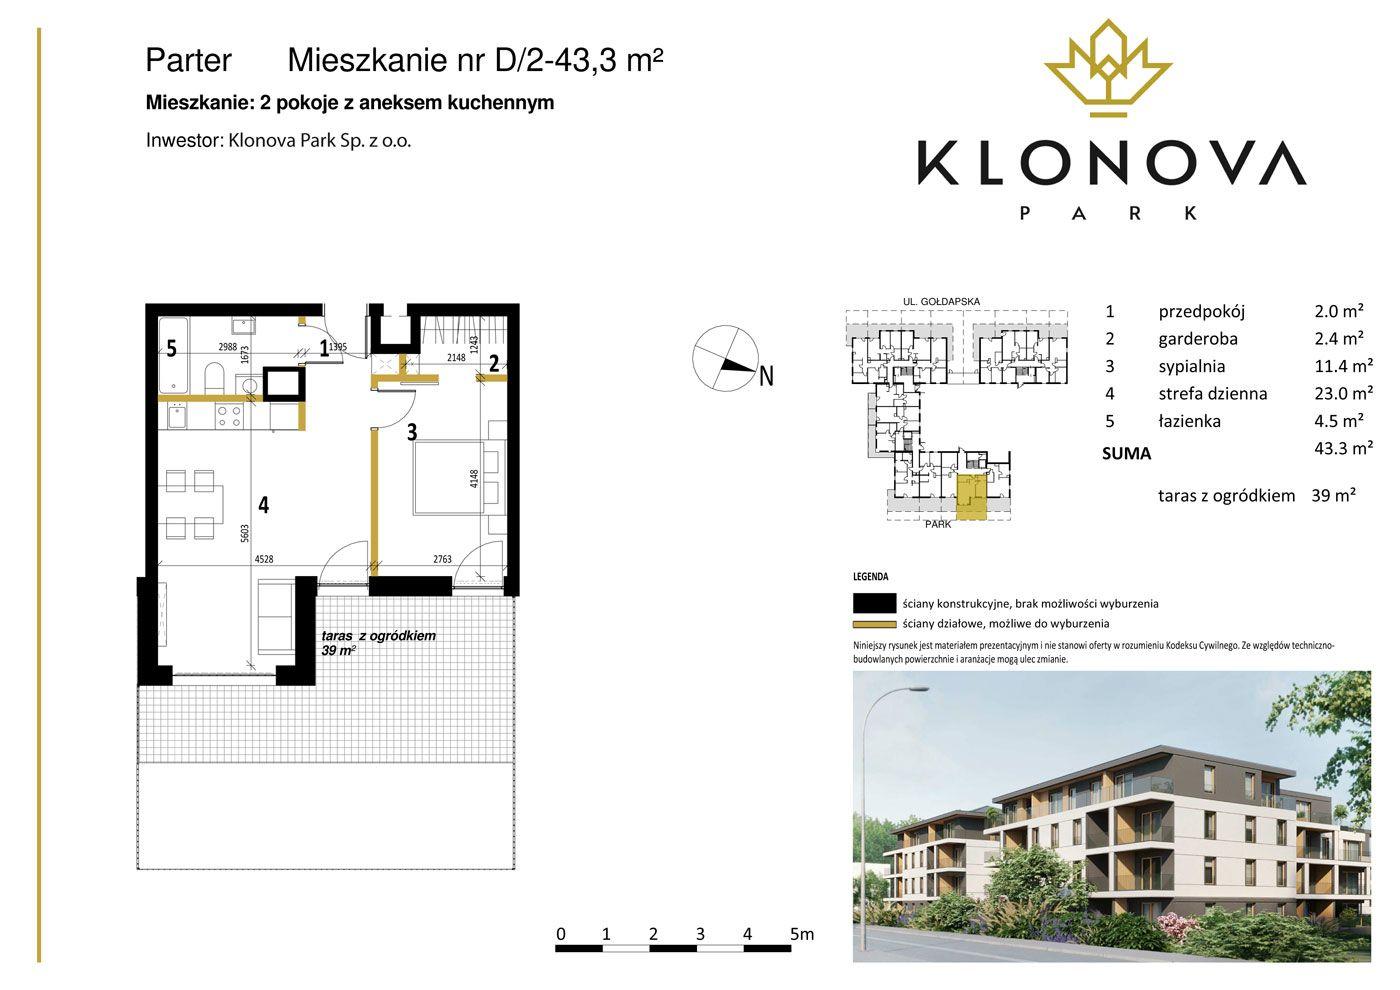 Apartamenty Klonova Park - Plan mieszkania D/2